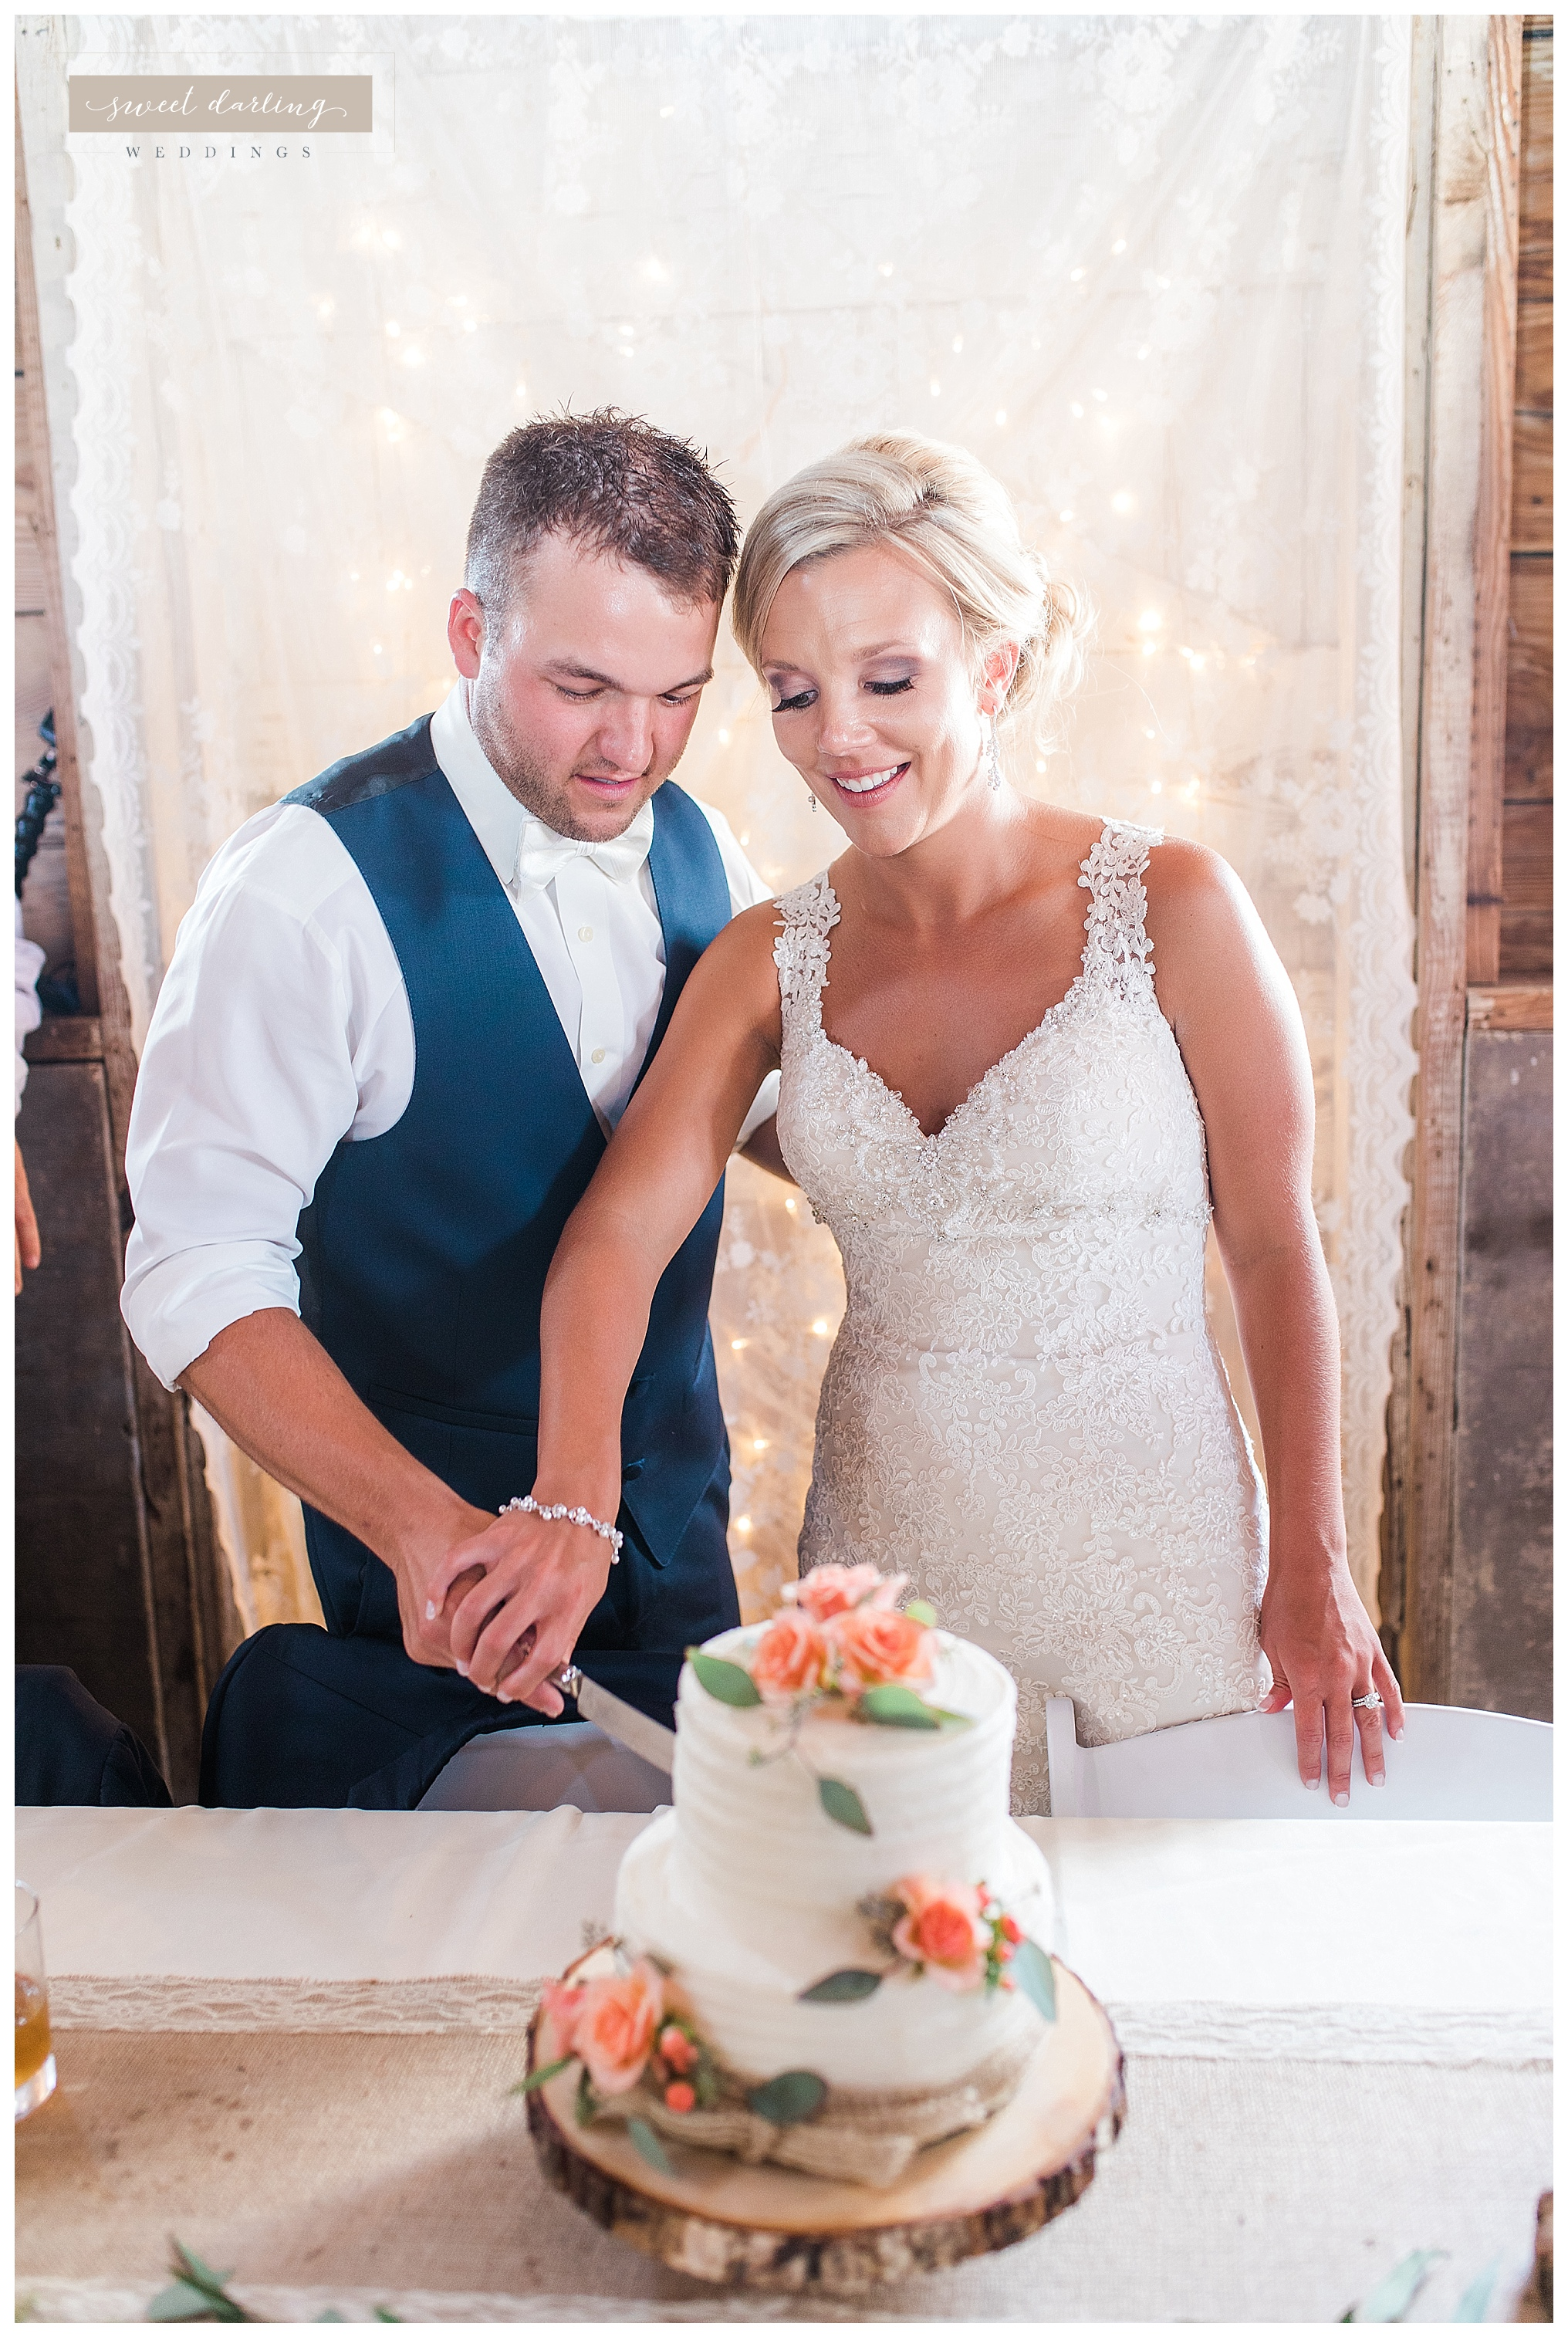 Paxton-illinois-engelbrecht-farmstead-romantic-wedding-photographer-sweet-darling-weddings_1228.jpg